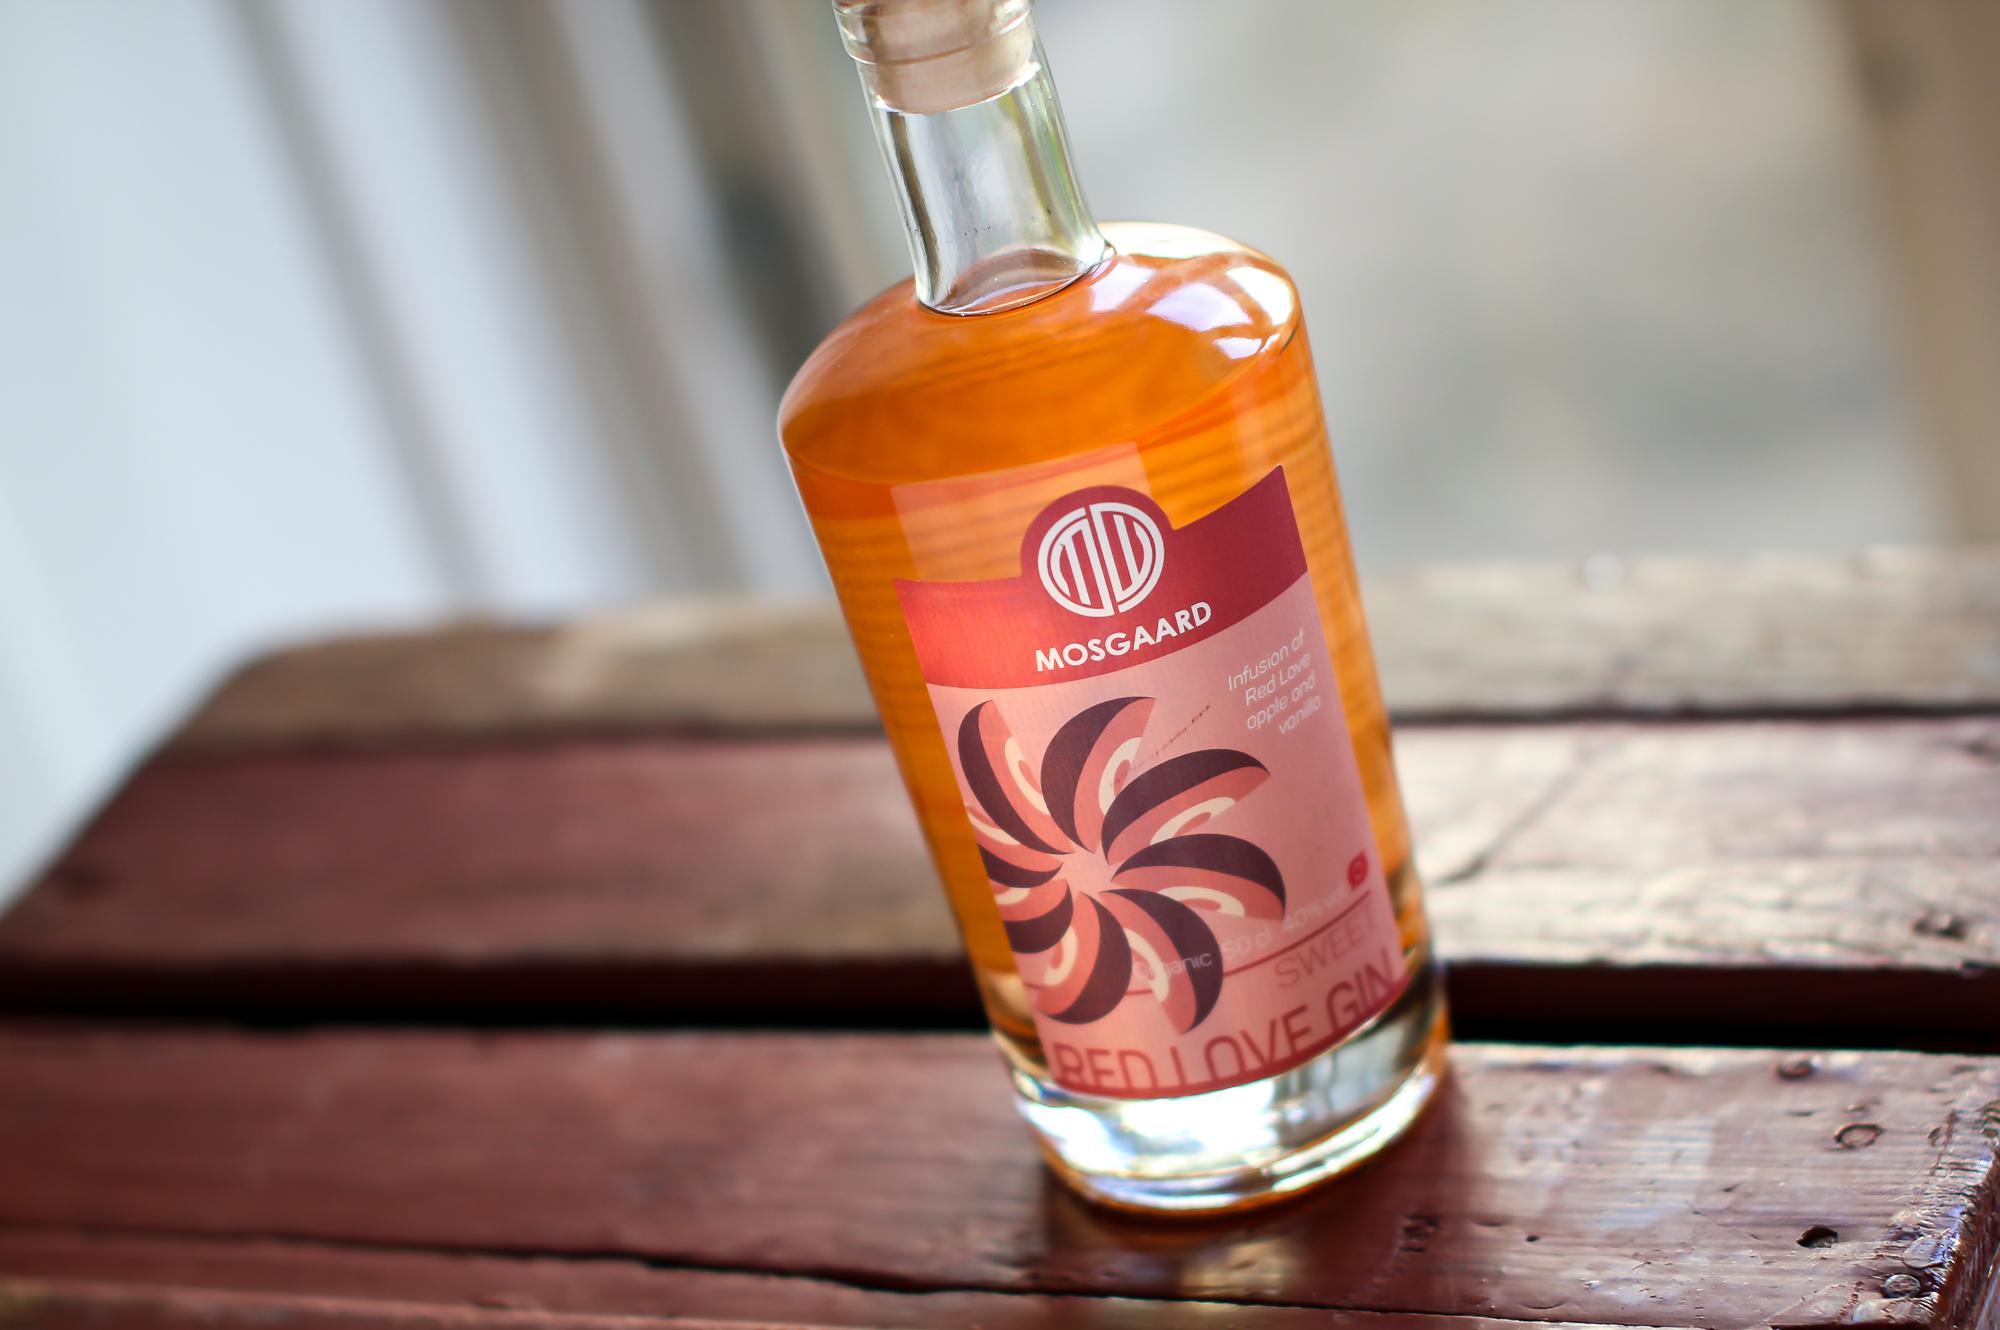 mosgaard-red-love-gin-3